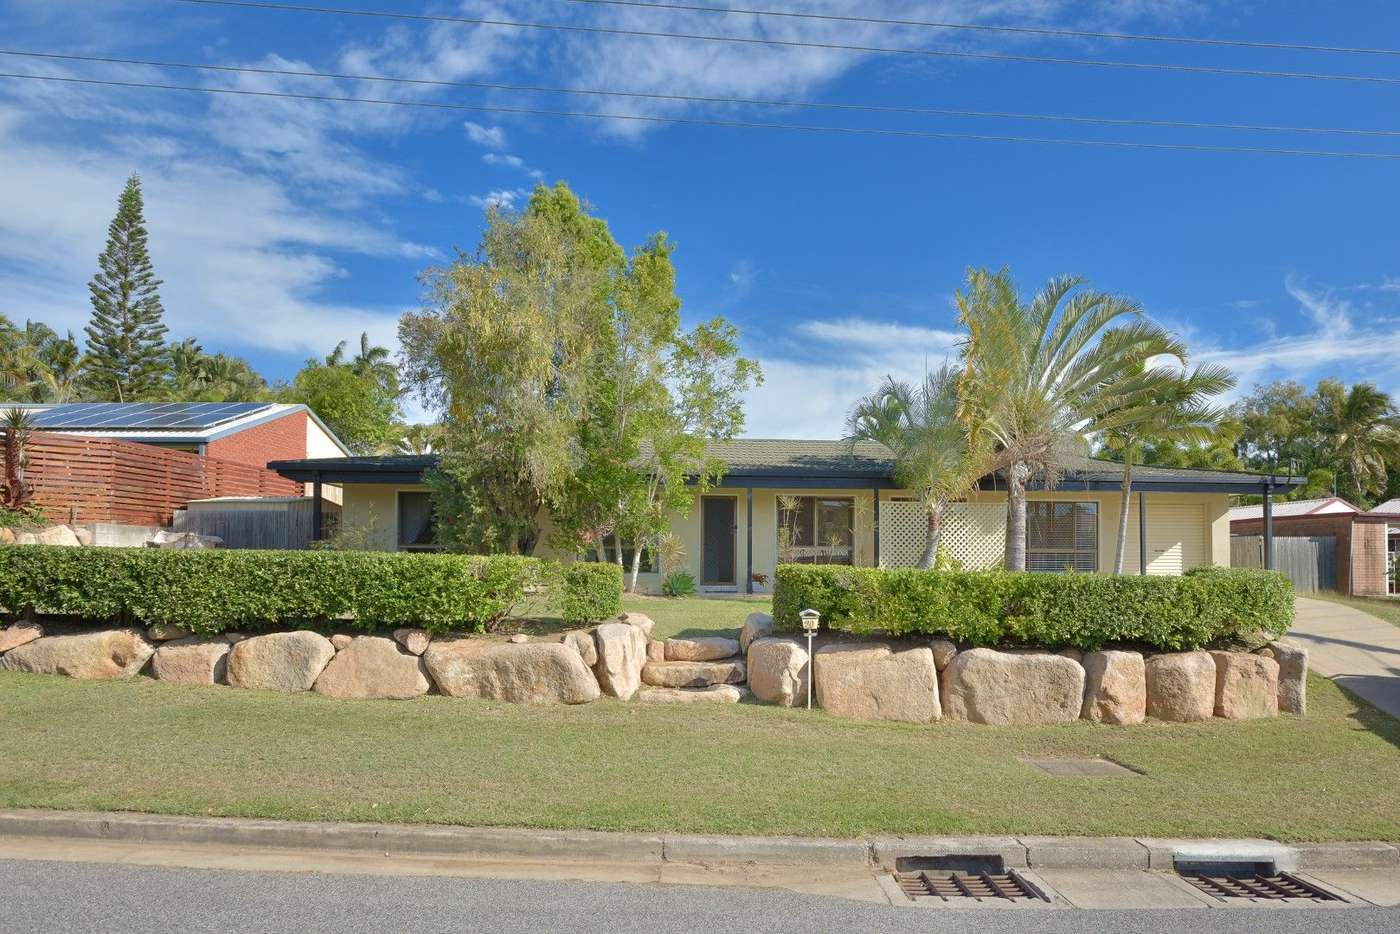 Main view of Homely house listing, 20 Waratah Street, Kin Kora QLD 4680